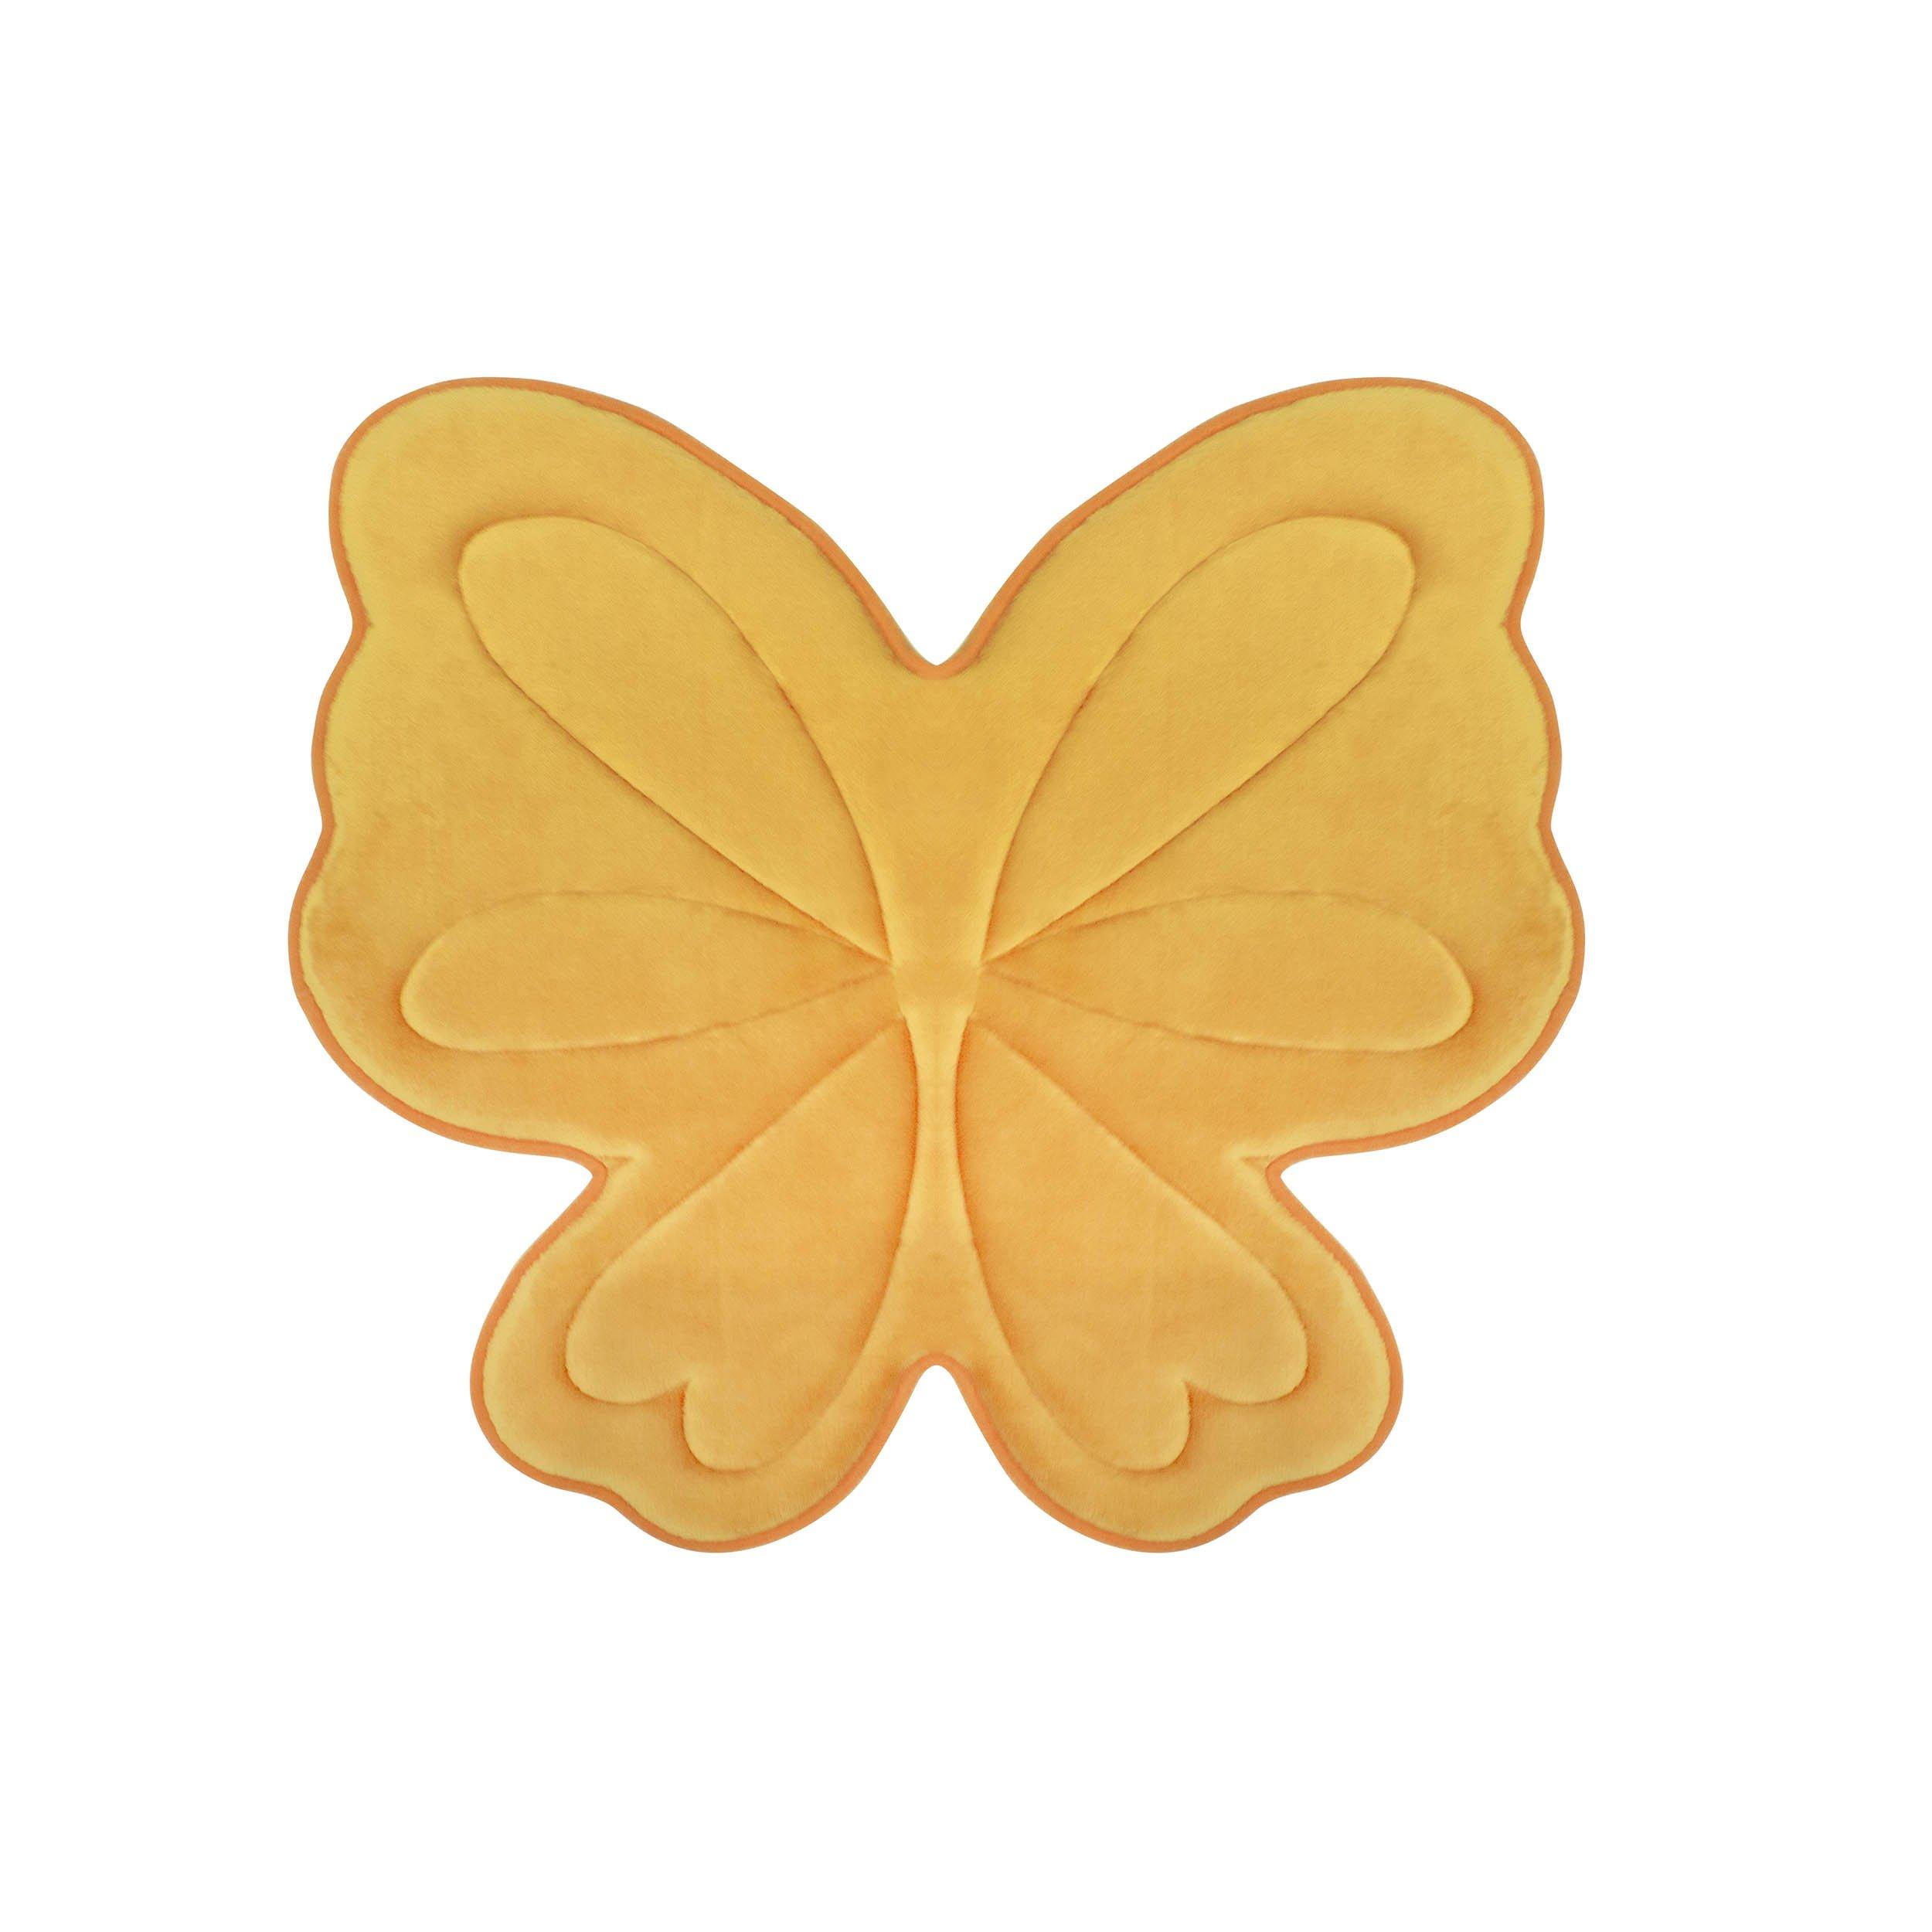 Bounce Comfort Memory Foam Butterfly 30 x 30 Bath Mat, Banana Yellow